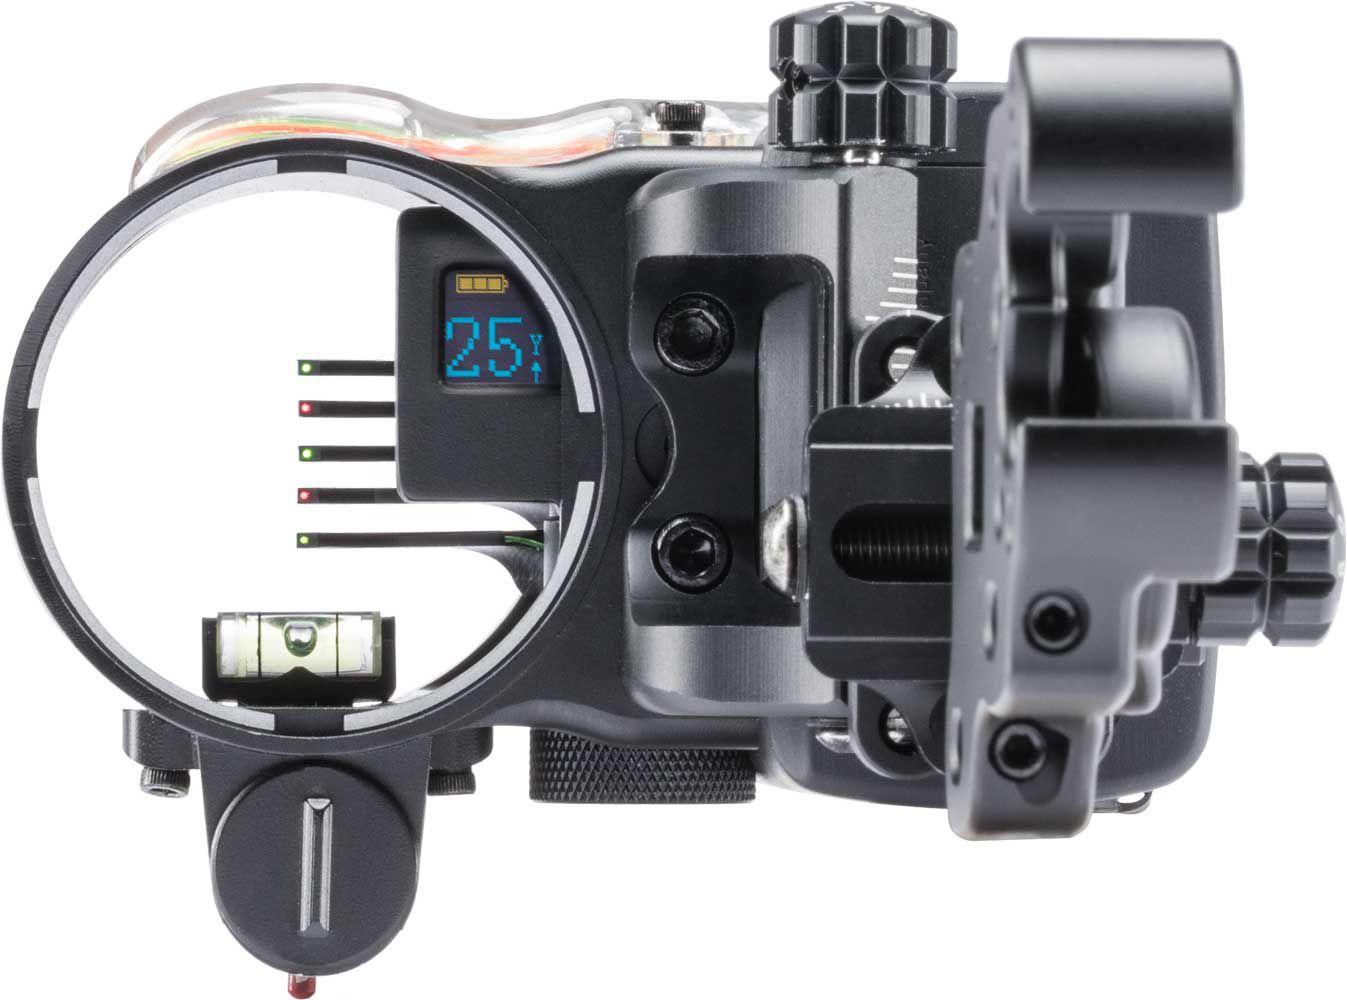 IQ Define Range Finding 5 Pin Archery Sight, Right Hand